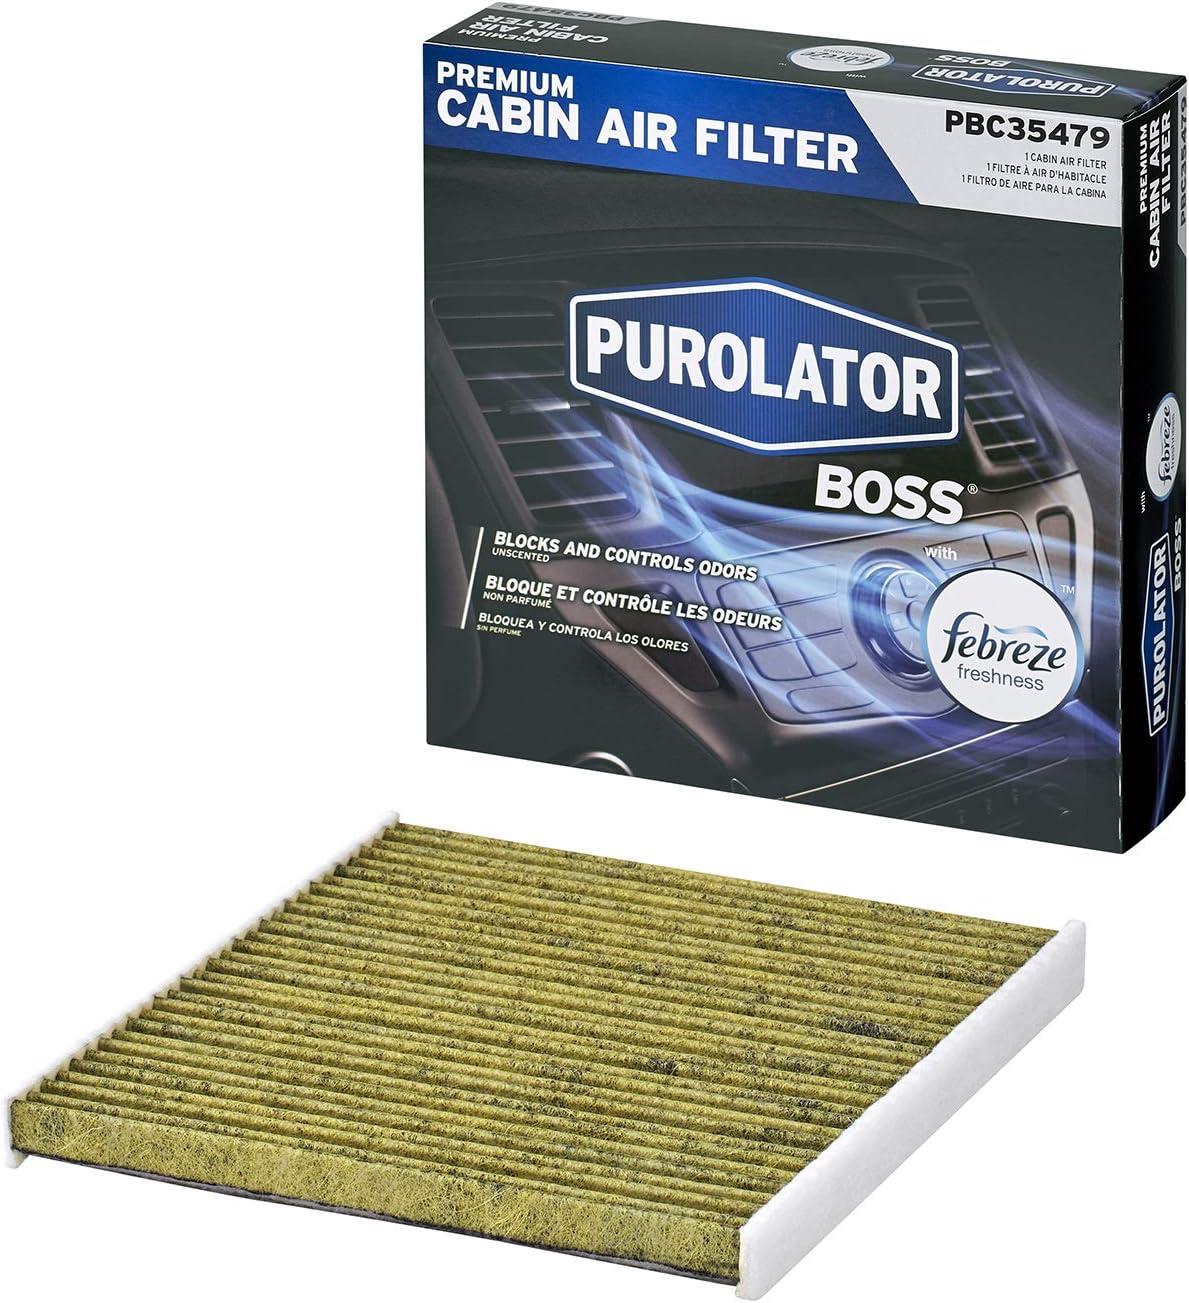 Purolator PBC35479 PurolatorBOSS Premium Cabin Air Filter with Febreze Freshness